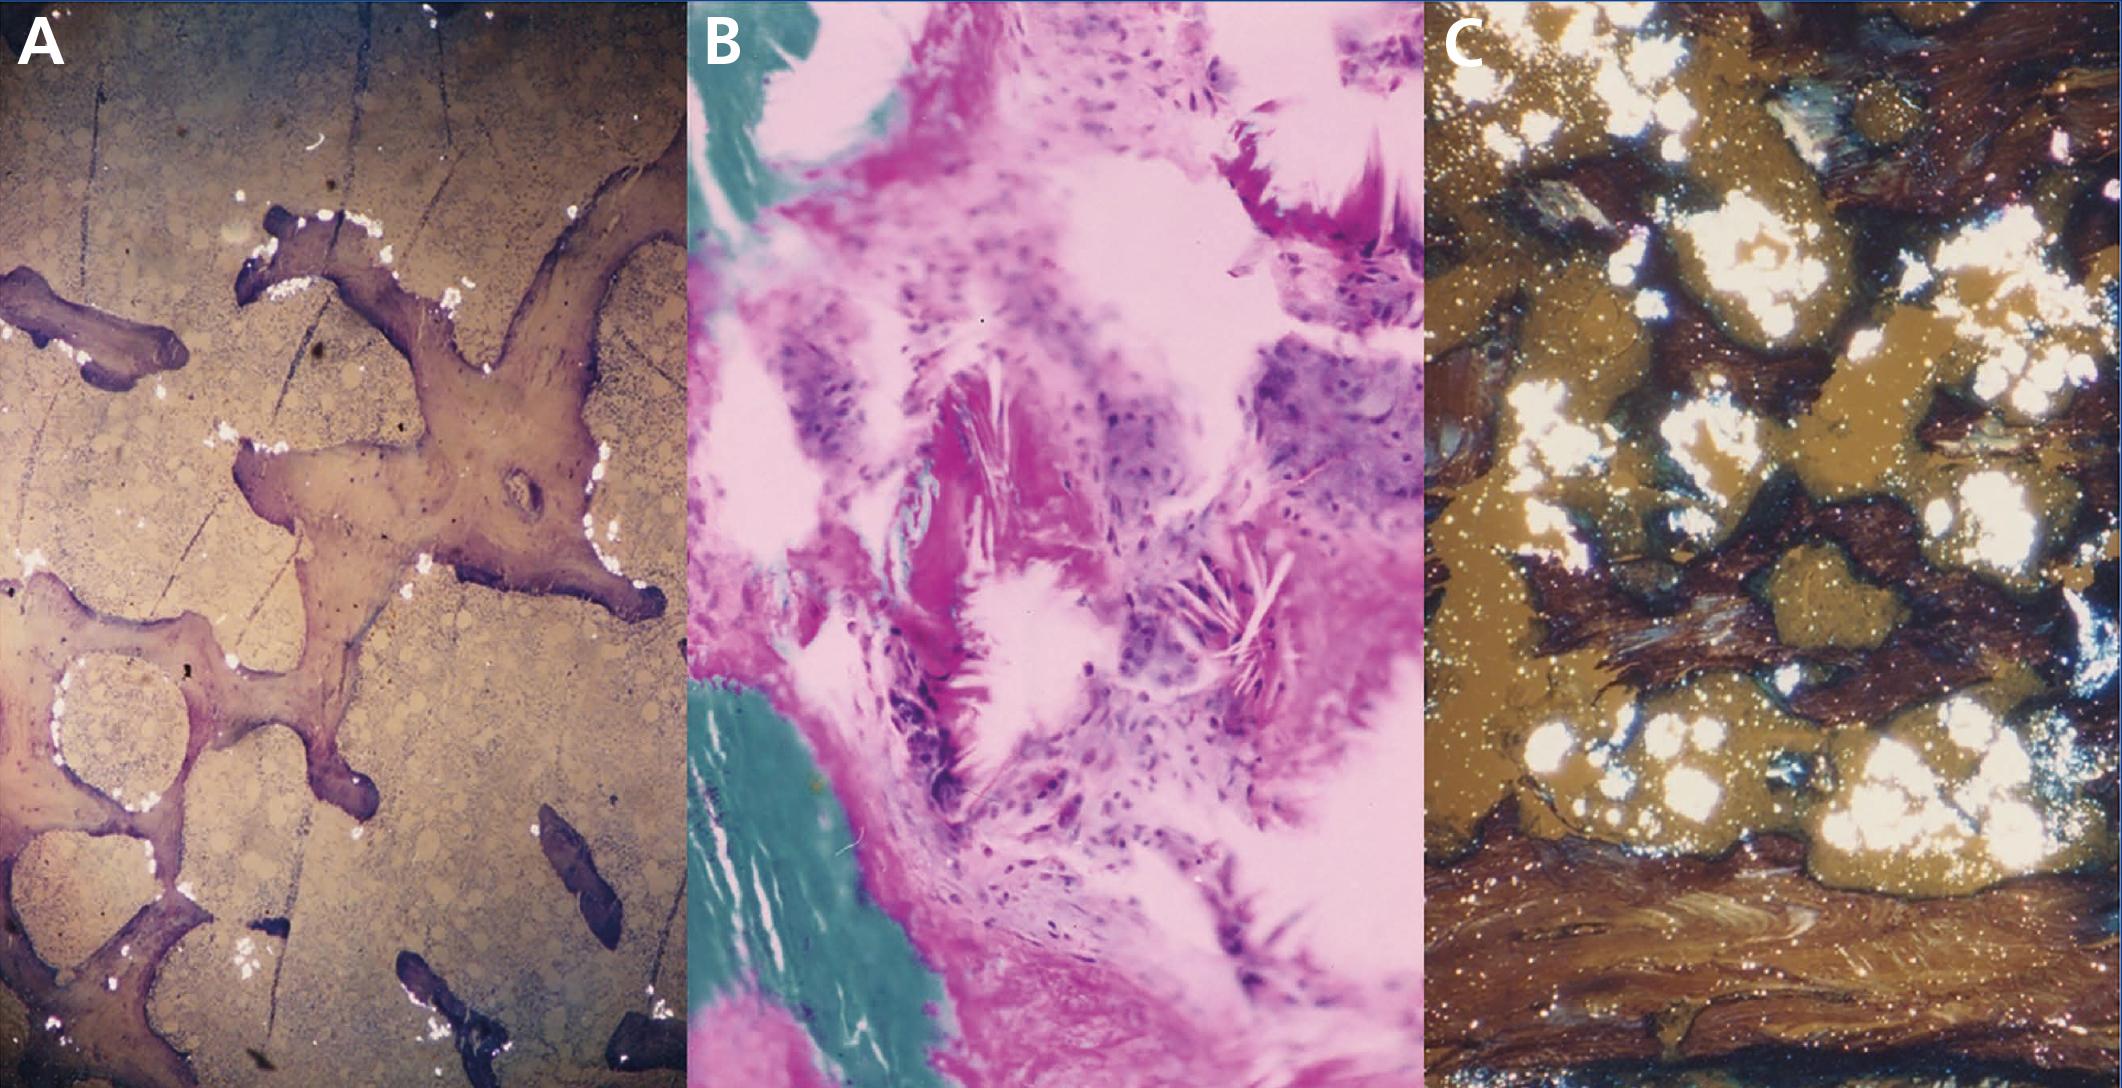 Hyperoxaluria and oxalosis